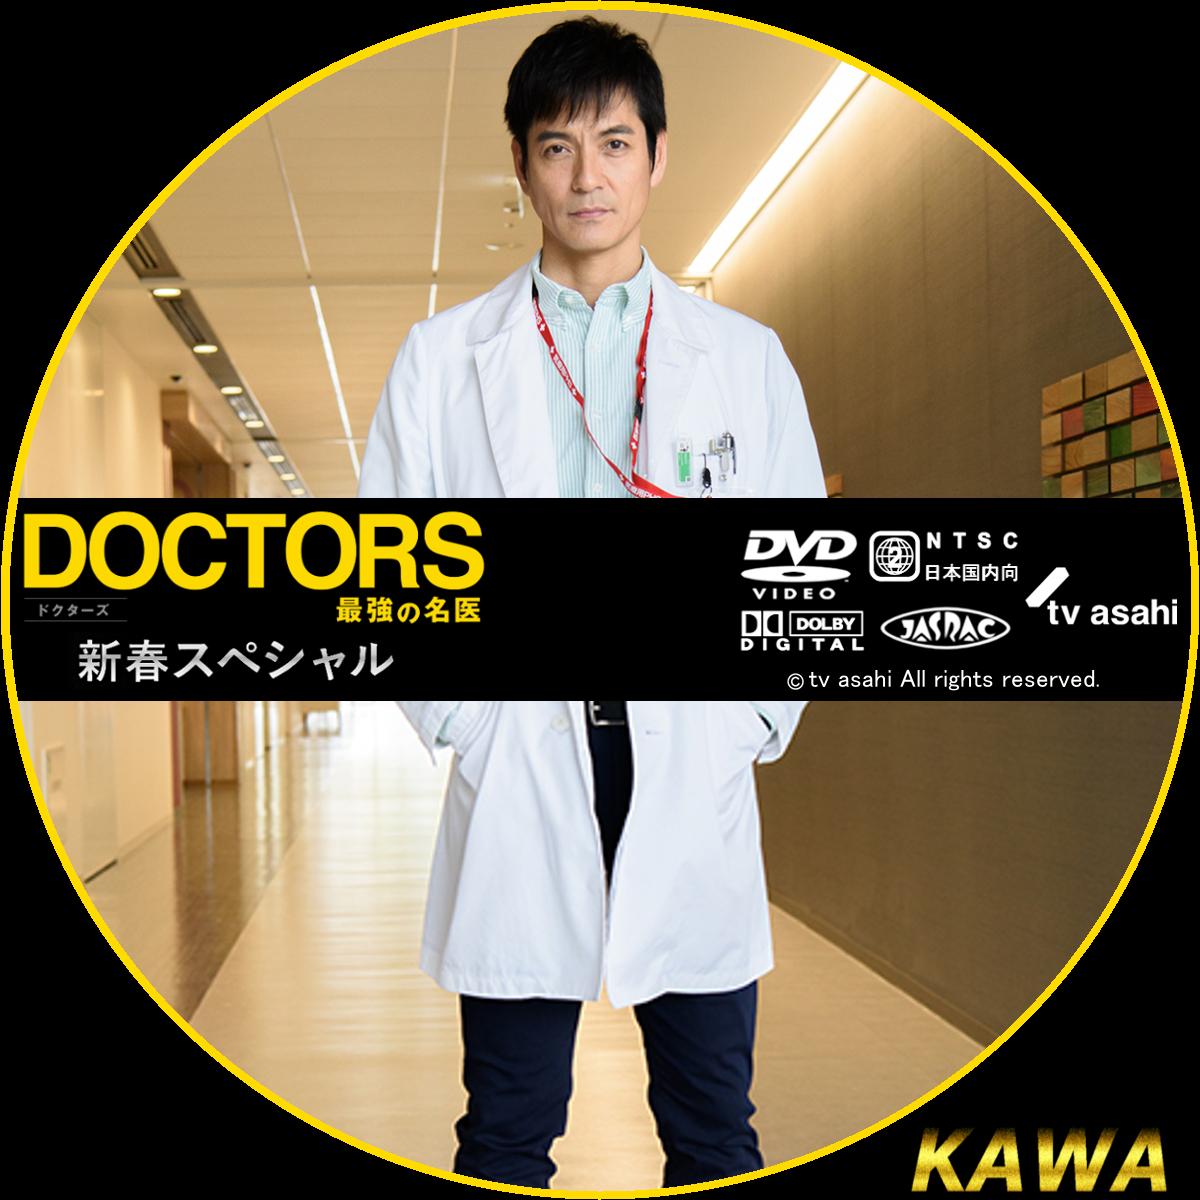 DOCTORS~最強の名医~新春スペシャル - かわらべ2